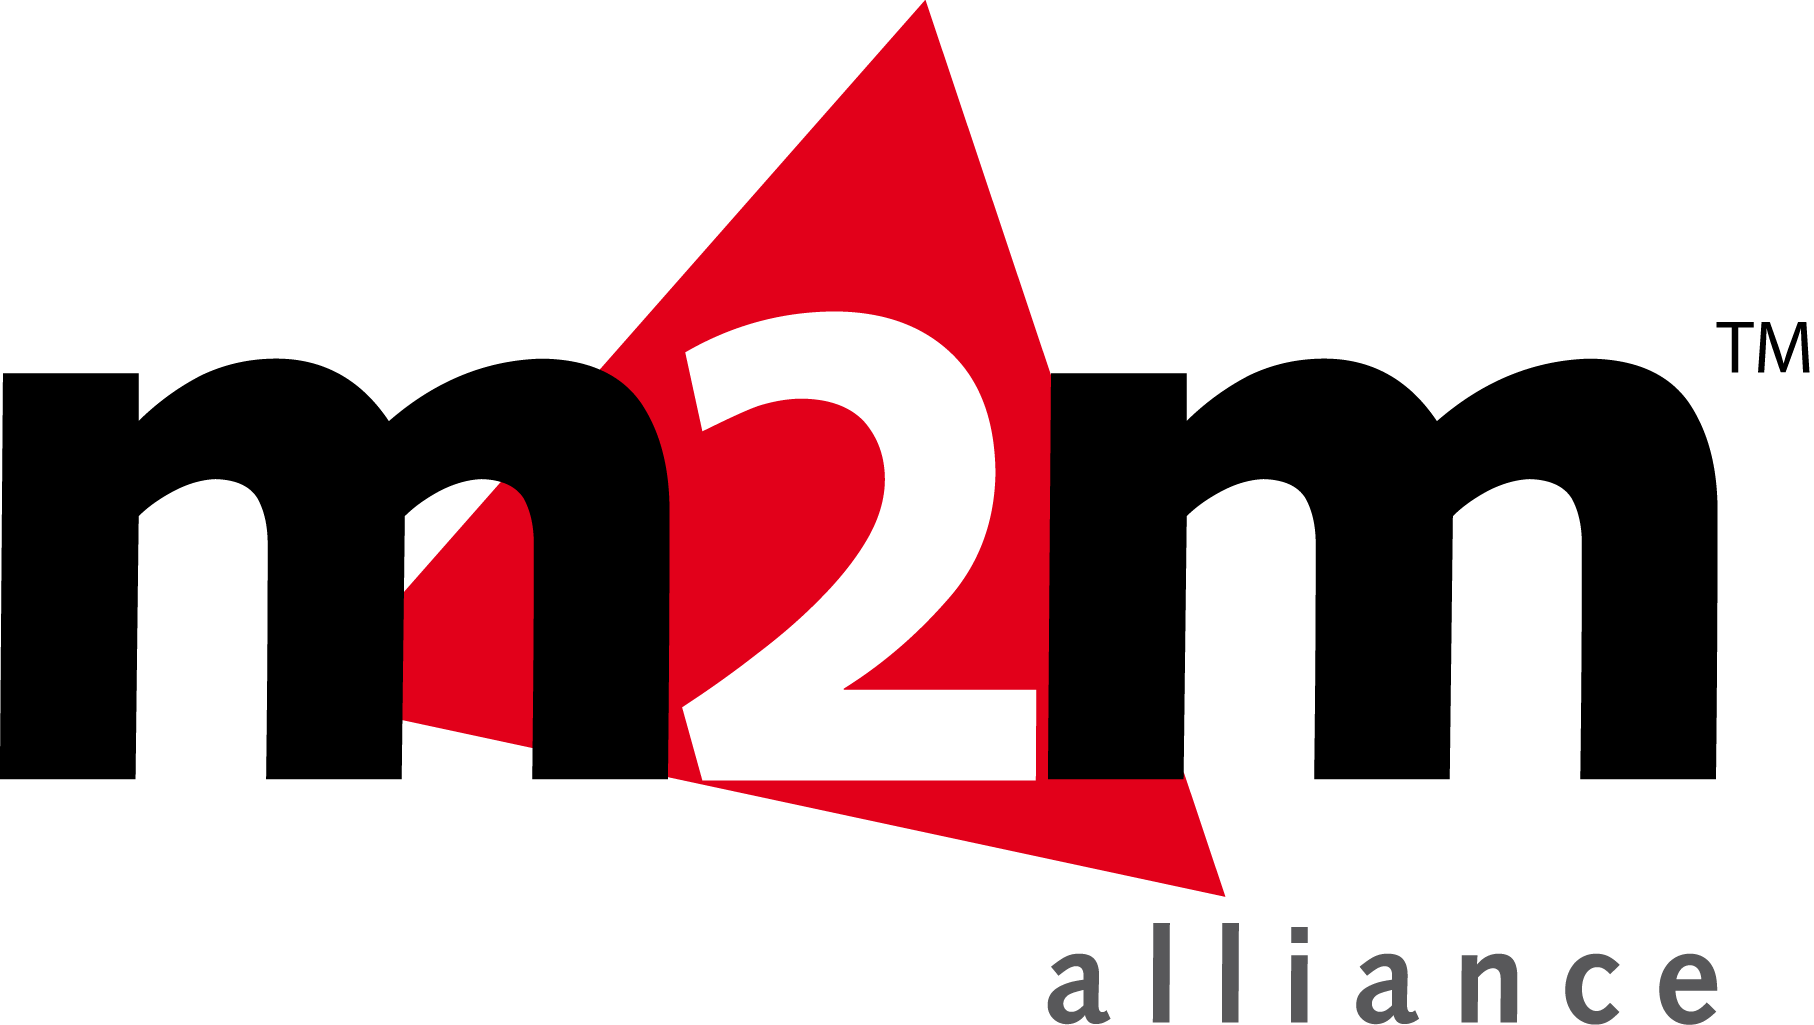 NGNI, Supporter Logo, m2mAlliance